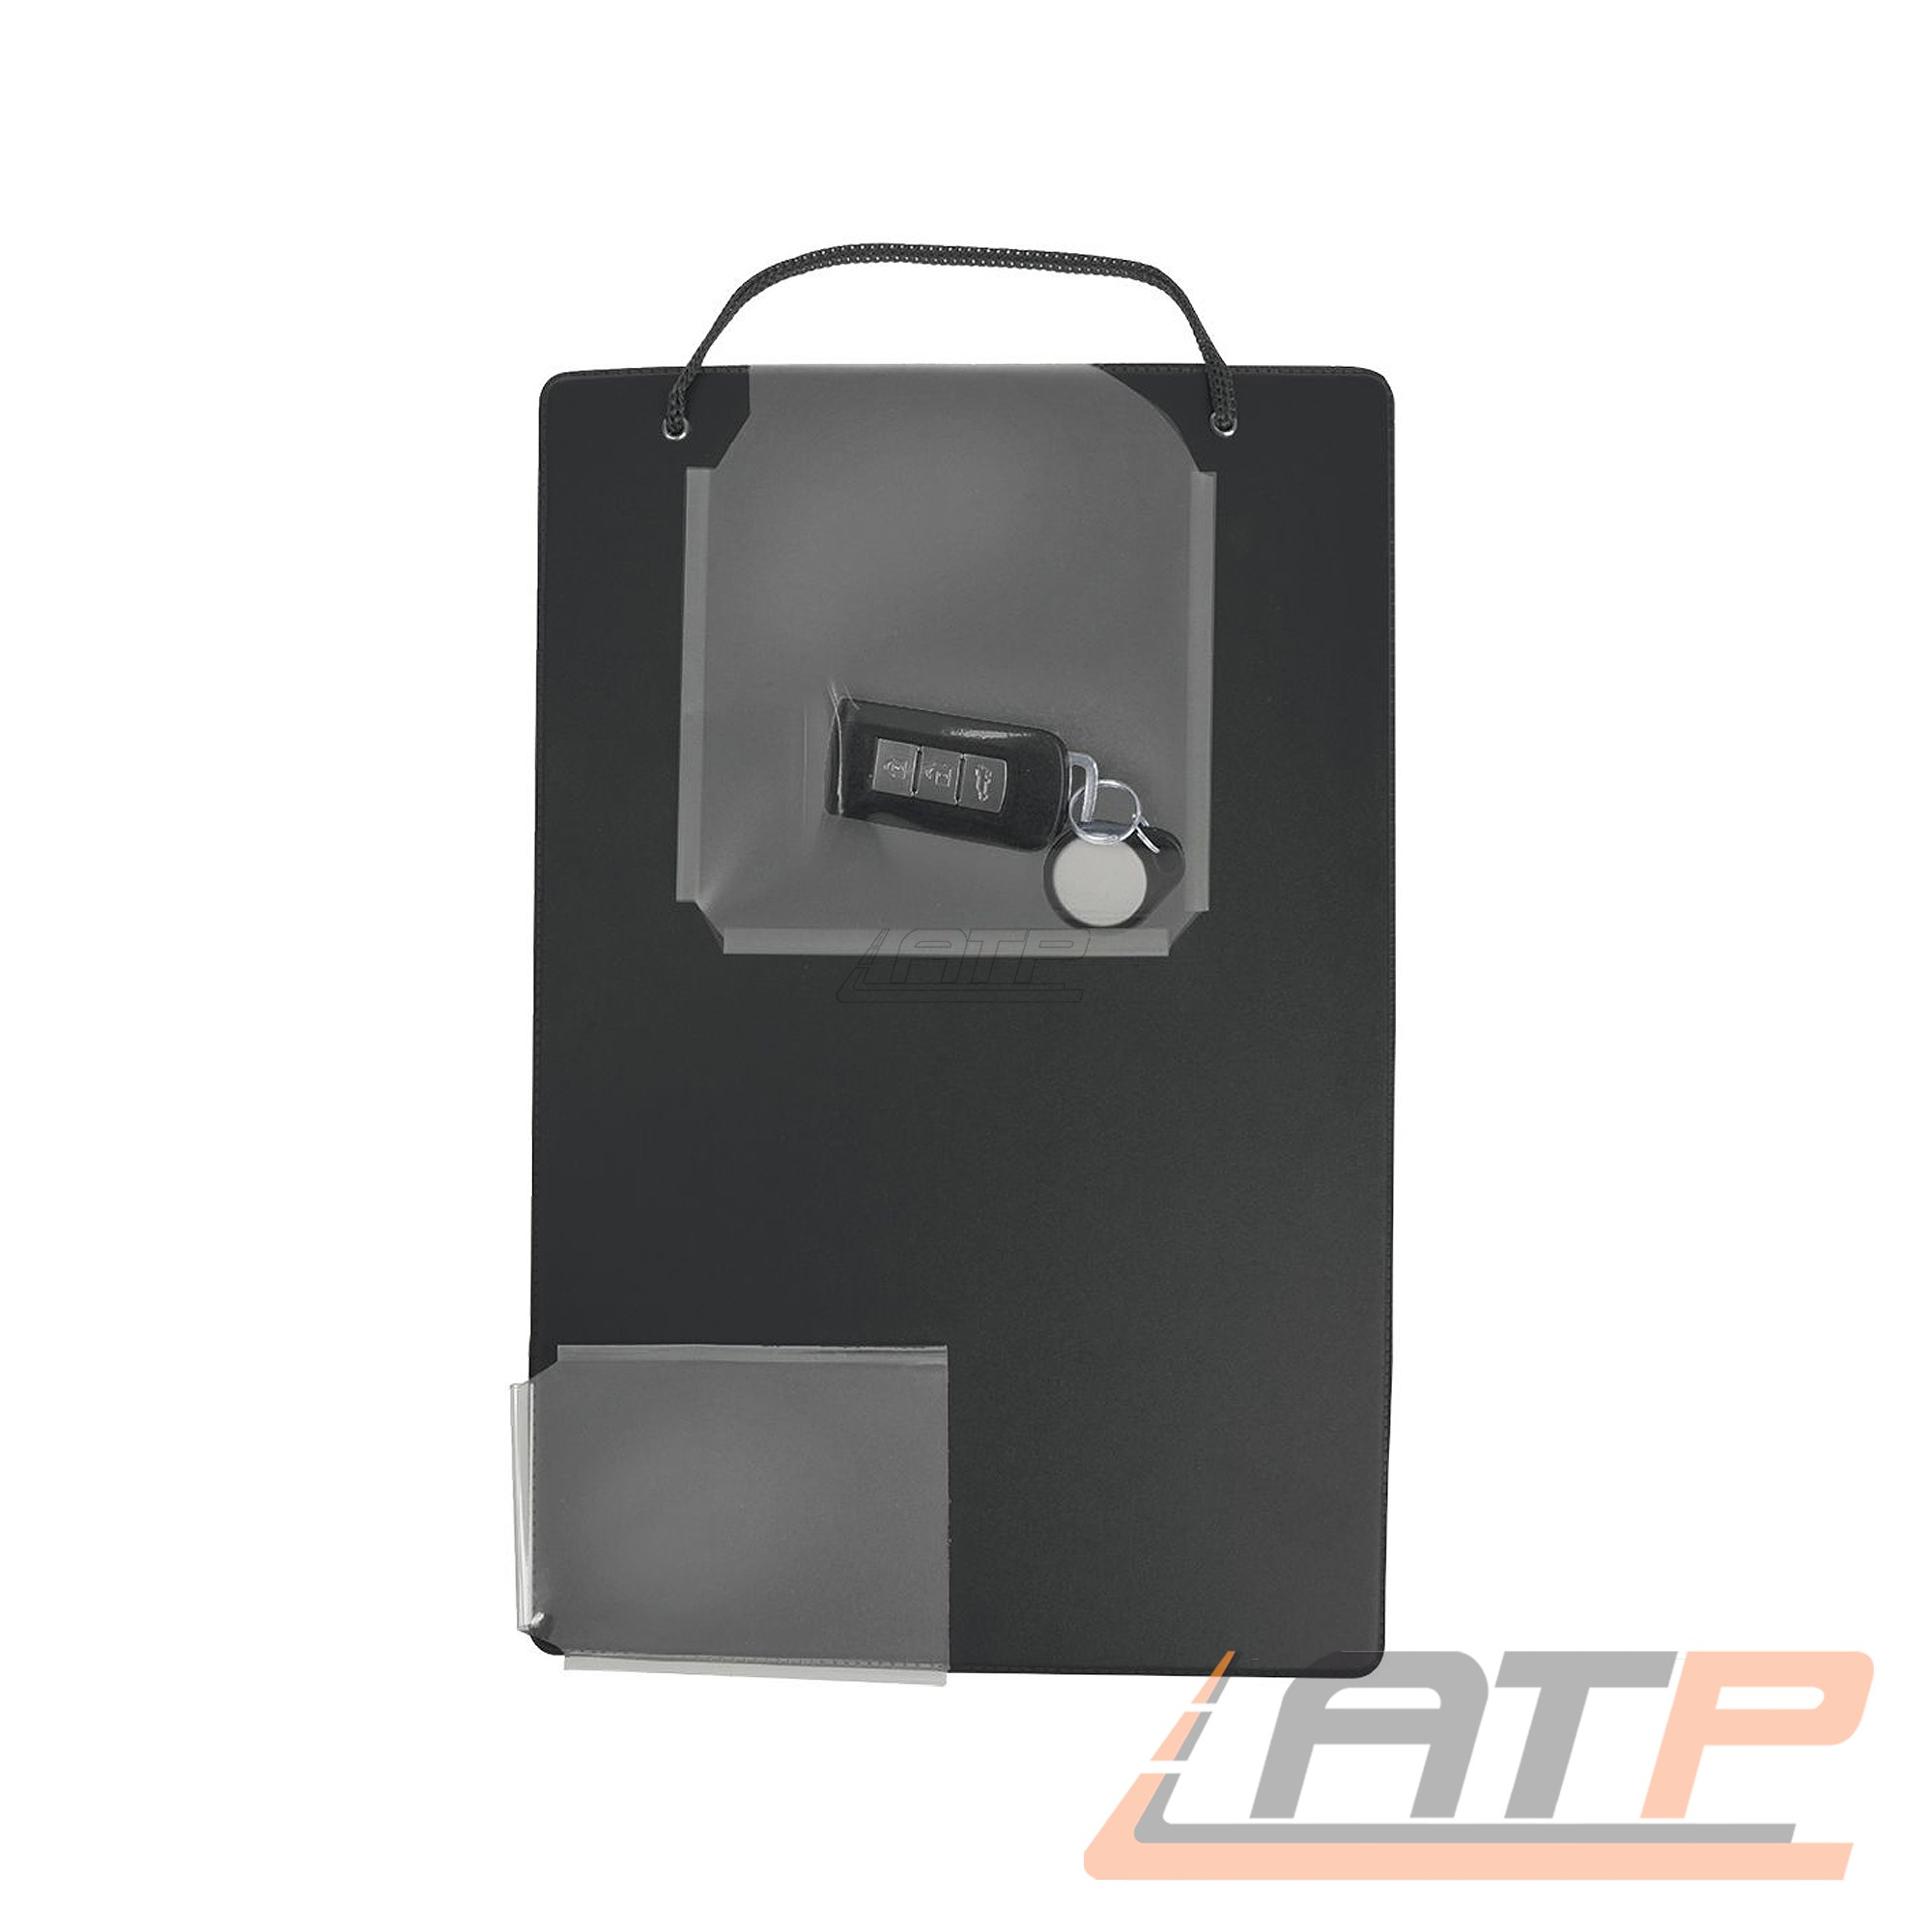 ProPlus atelier commande poches 10er Pack Noir schlüsselfach DIN a4 31811950